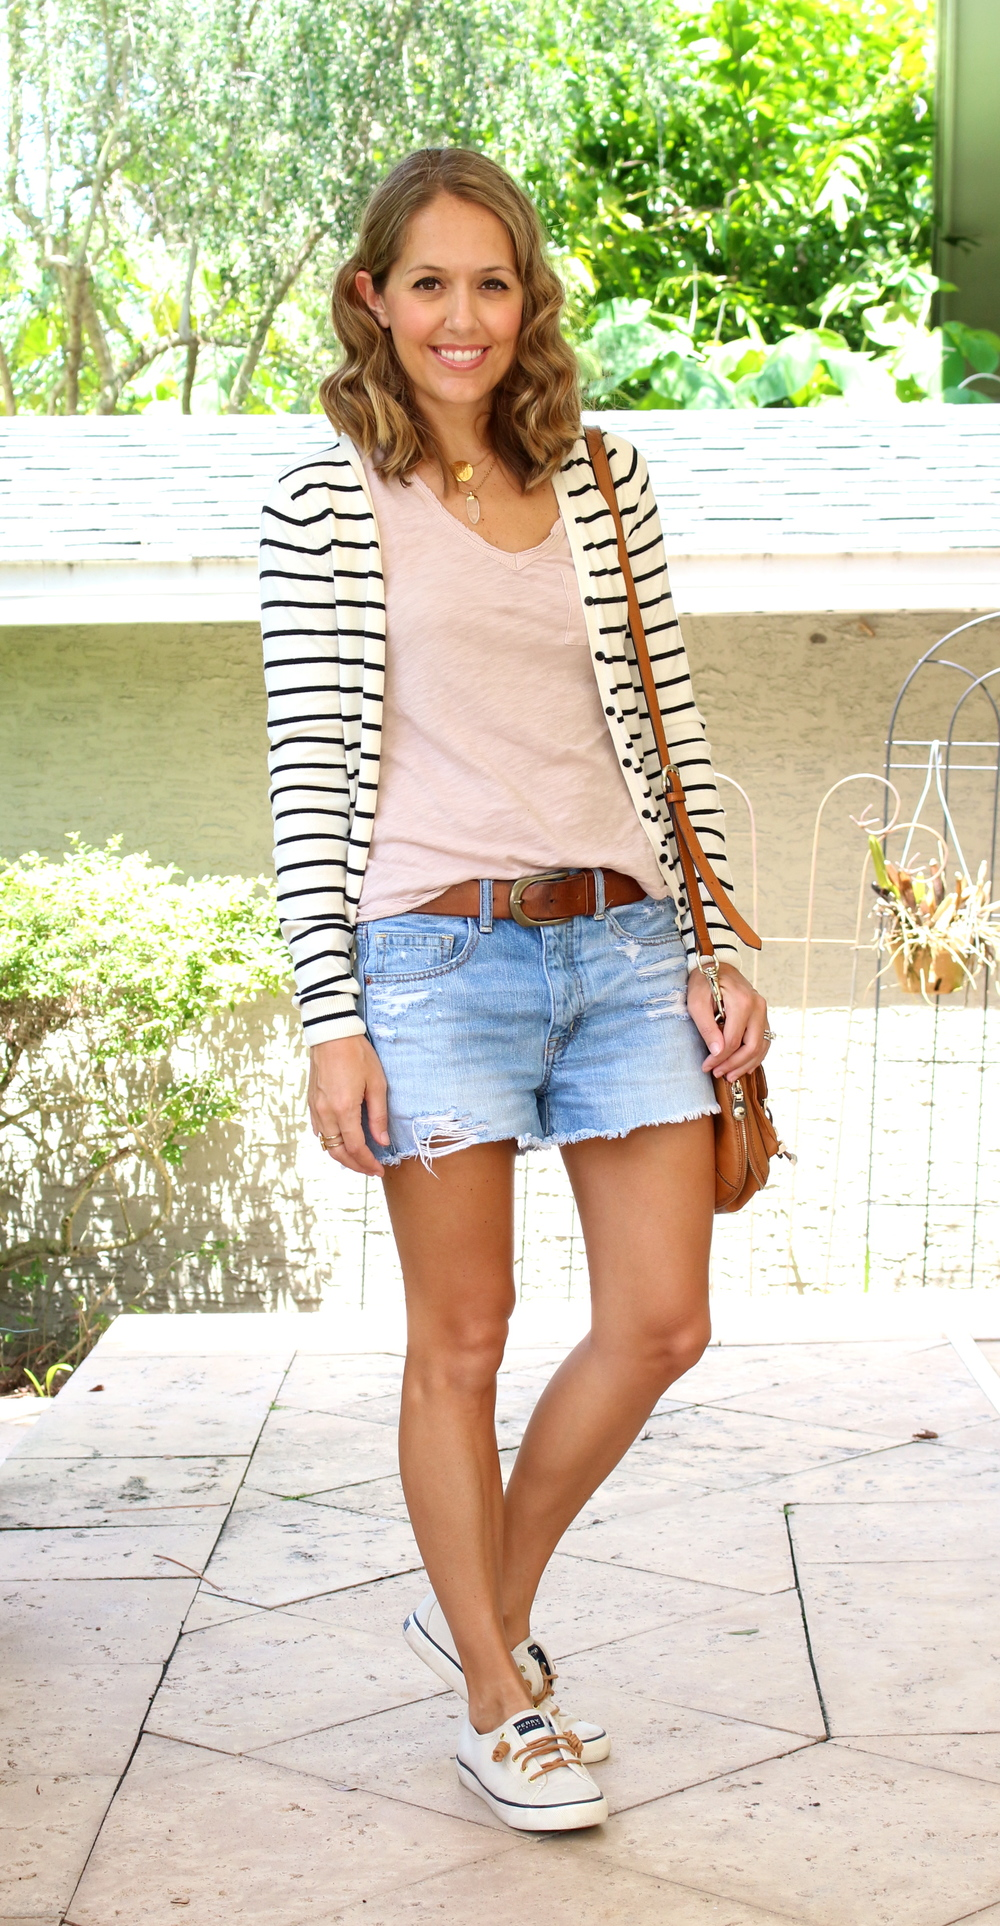 Striped cardigan, denim shorts, Sperrys